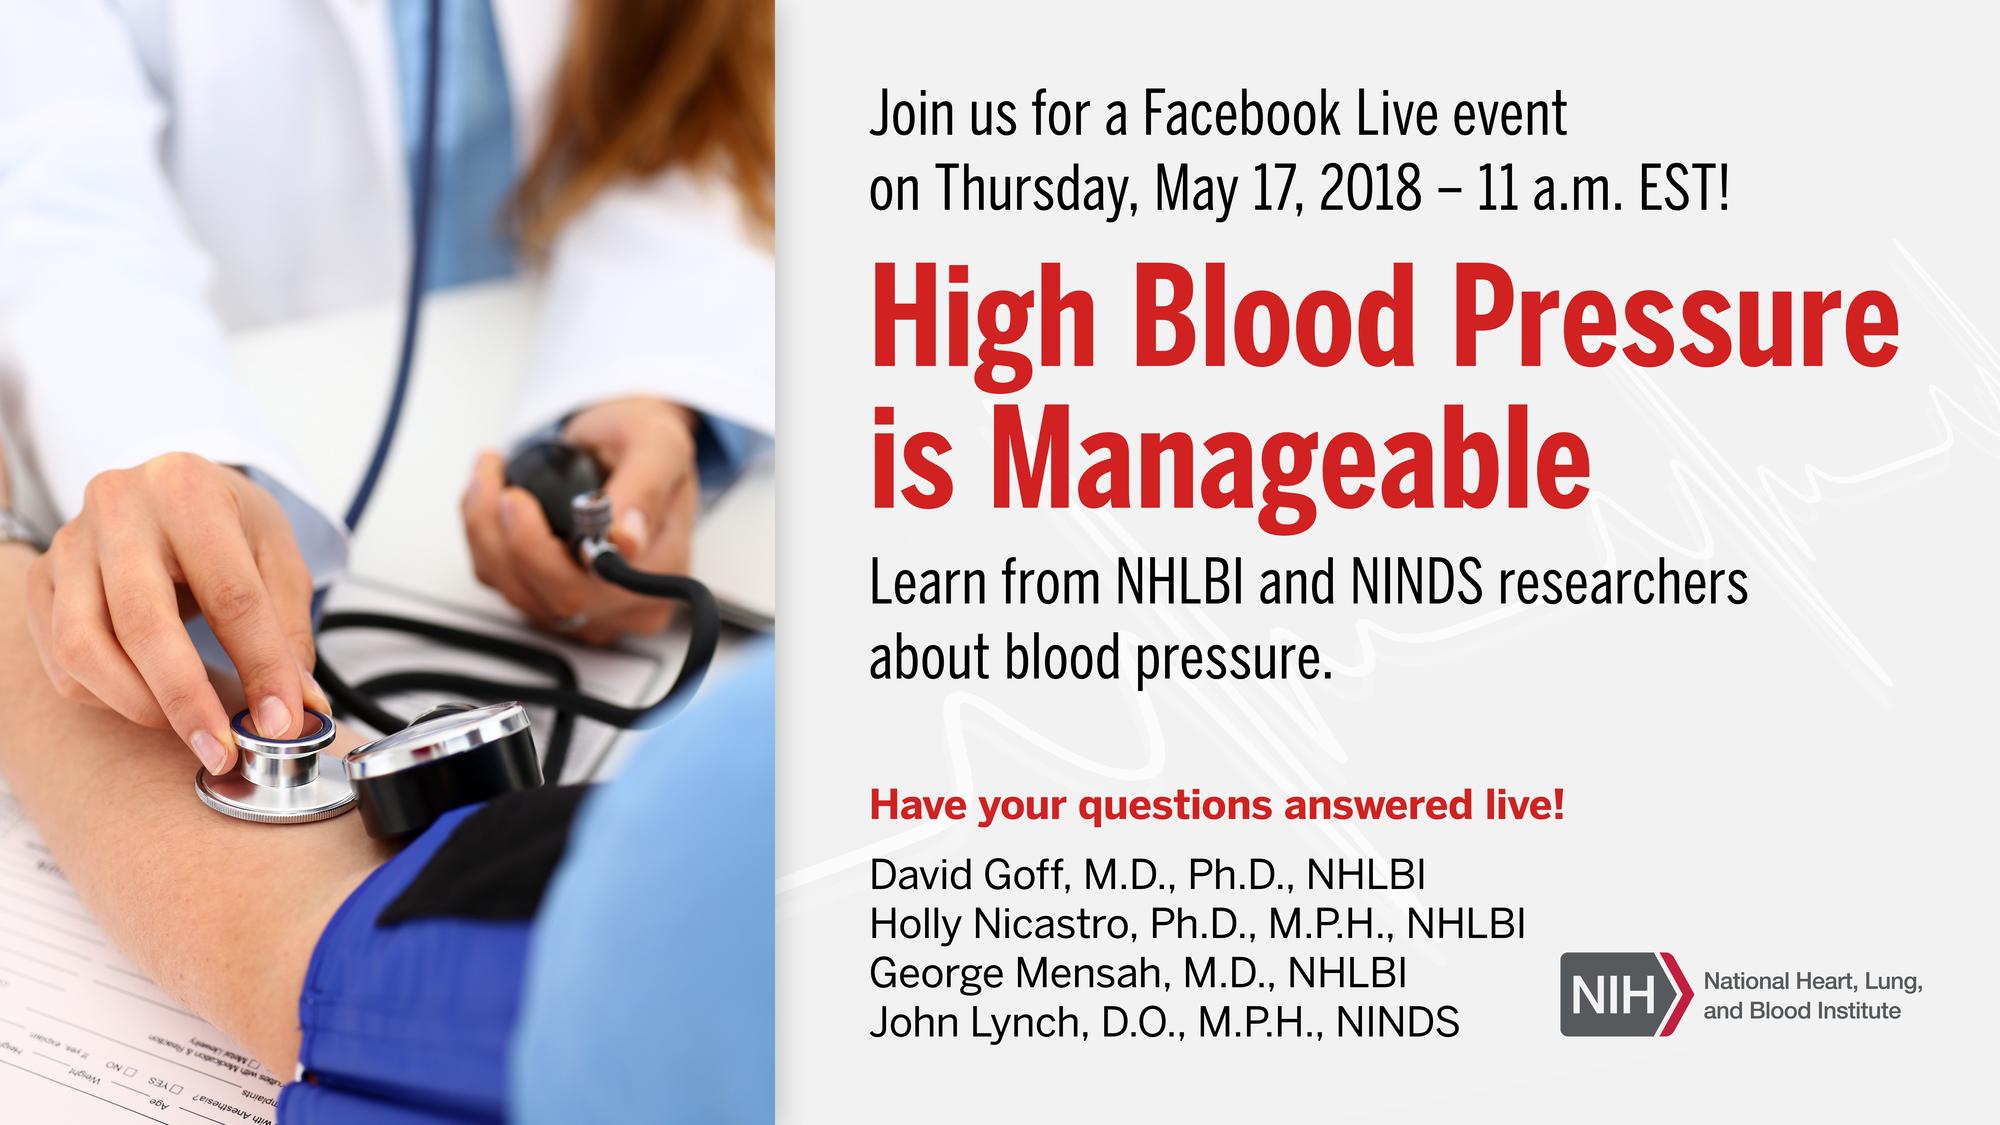 NHLBI World Hypertension Day Facebook Live